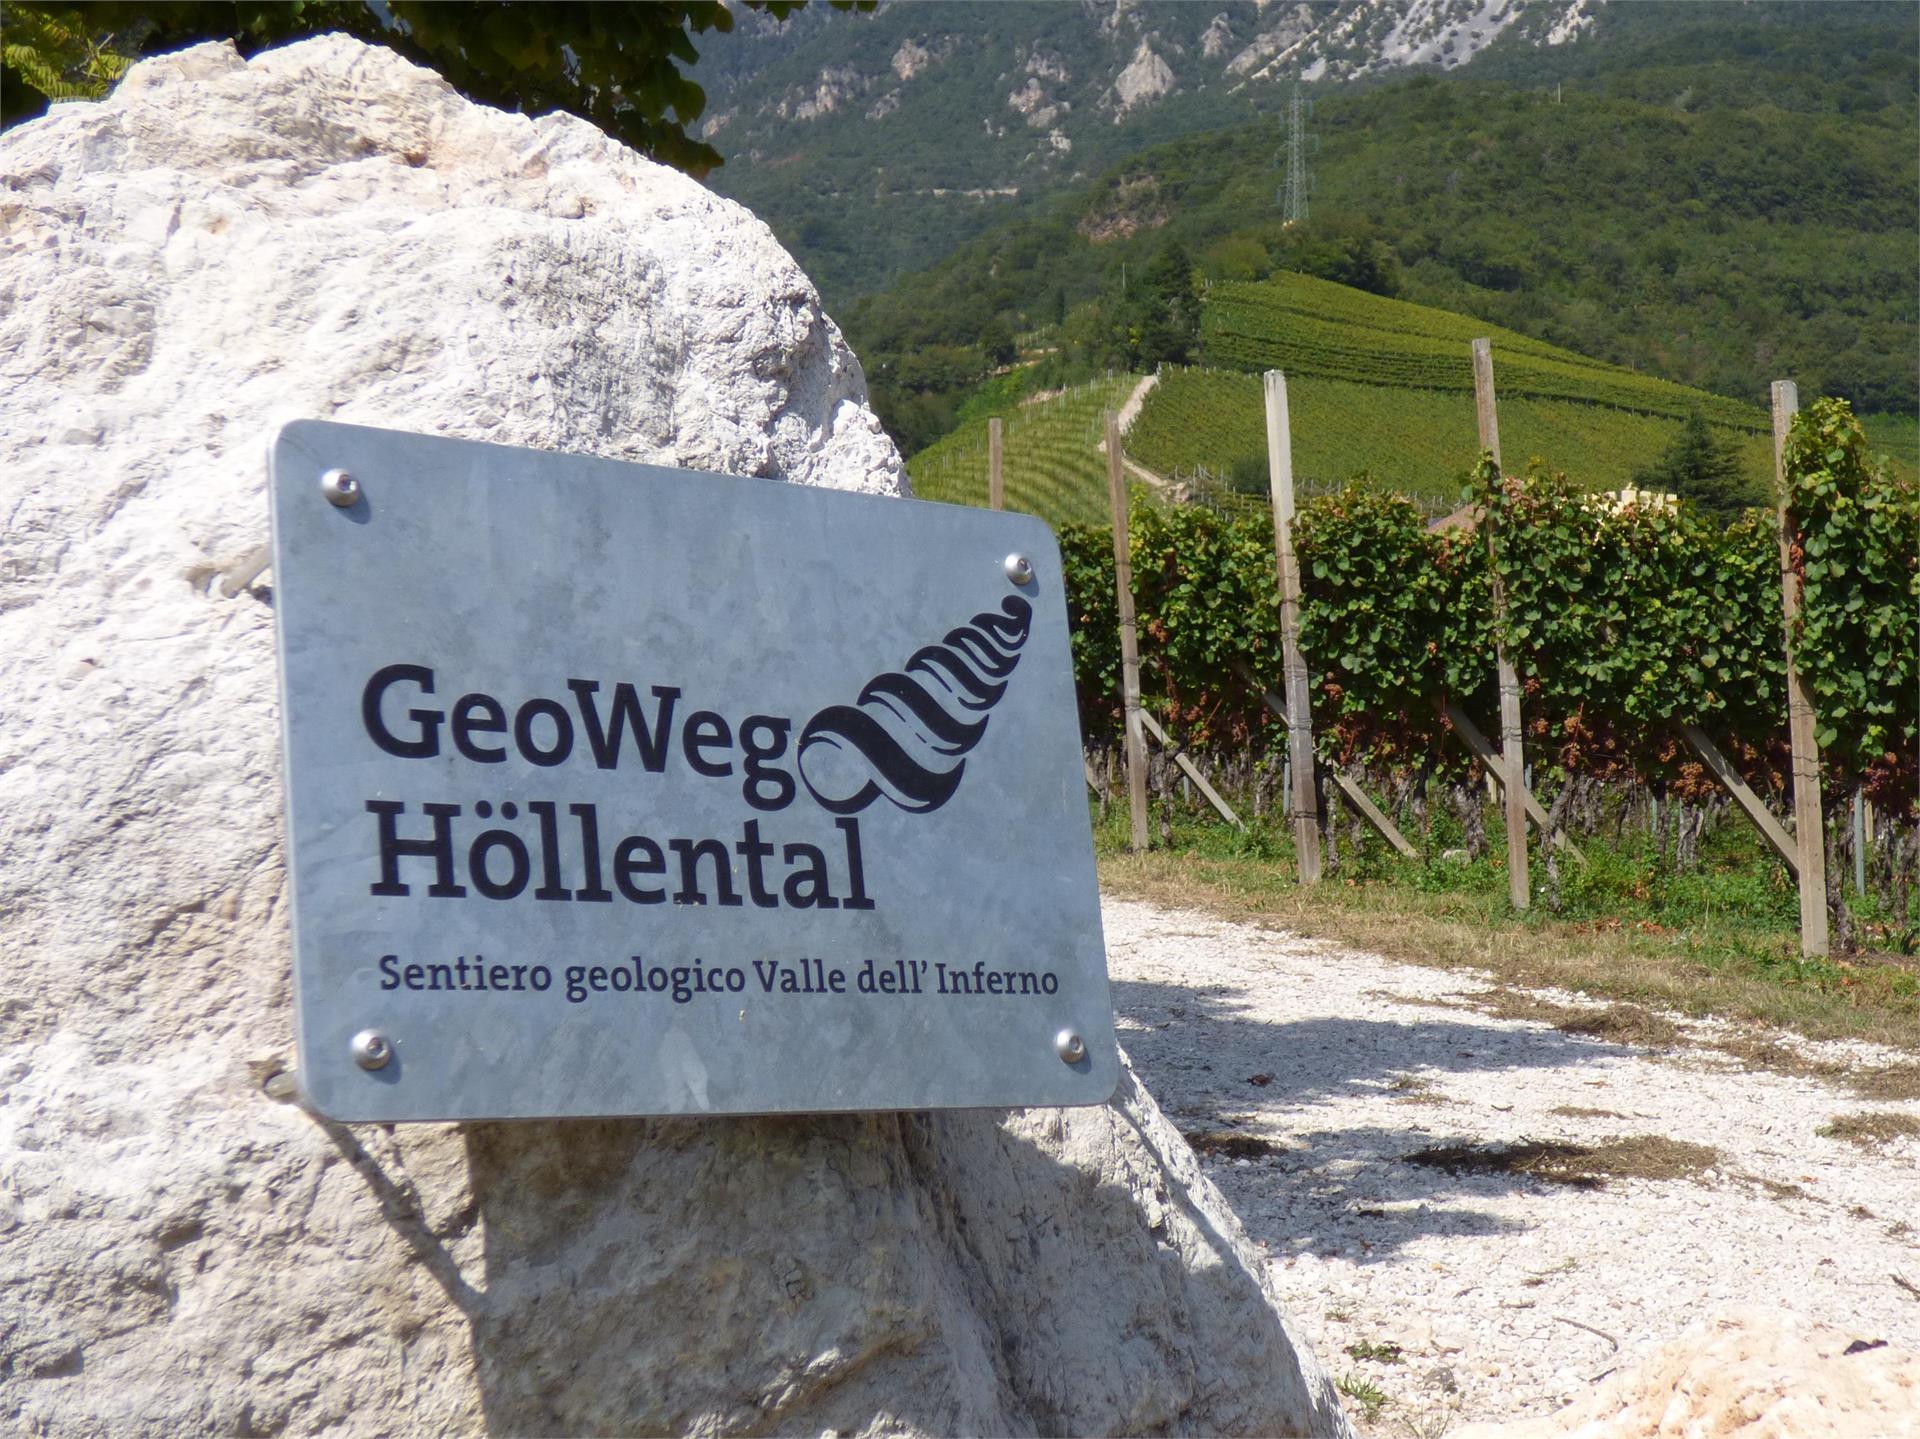 Themenweg GeoWeg Höllental in Tramin